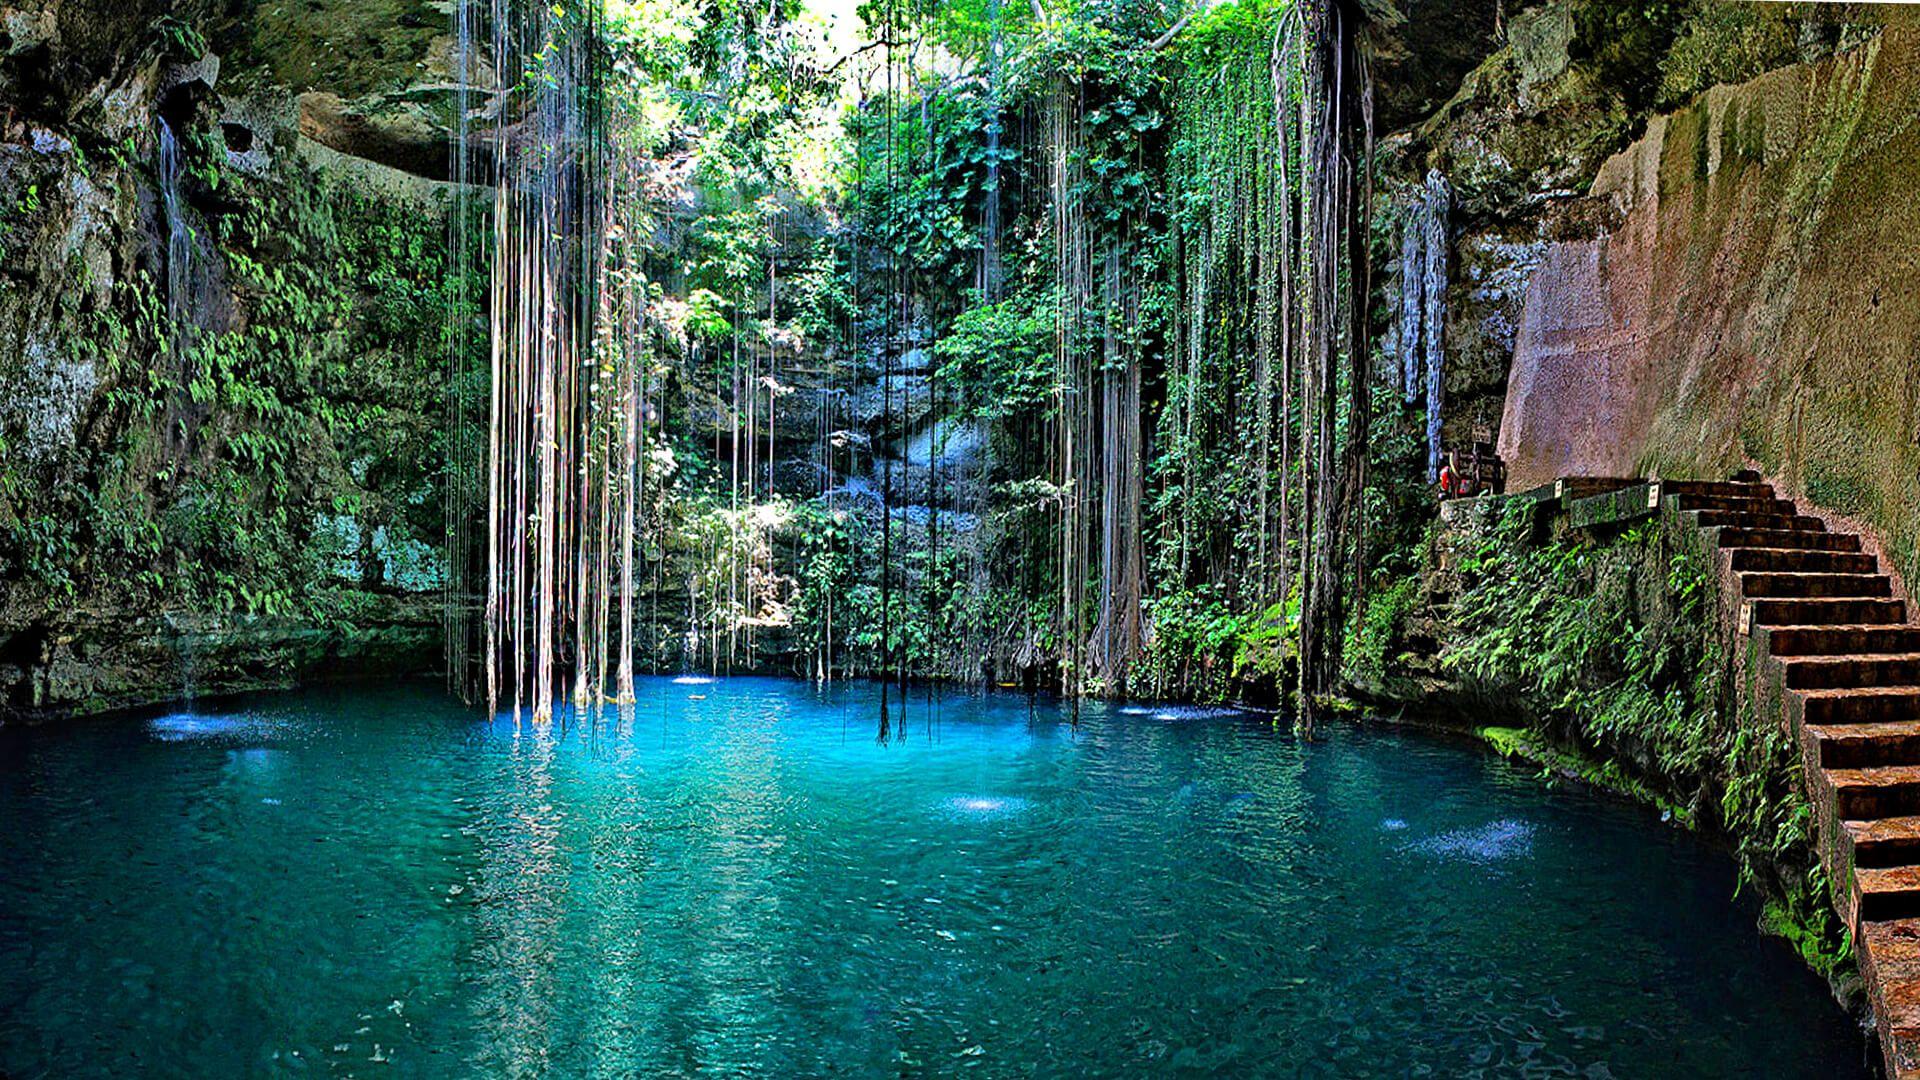 Ik Kil cenote Wallpaper 2017 Cancun mexico travel